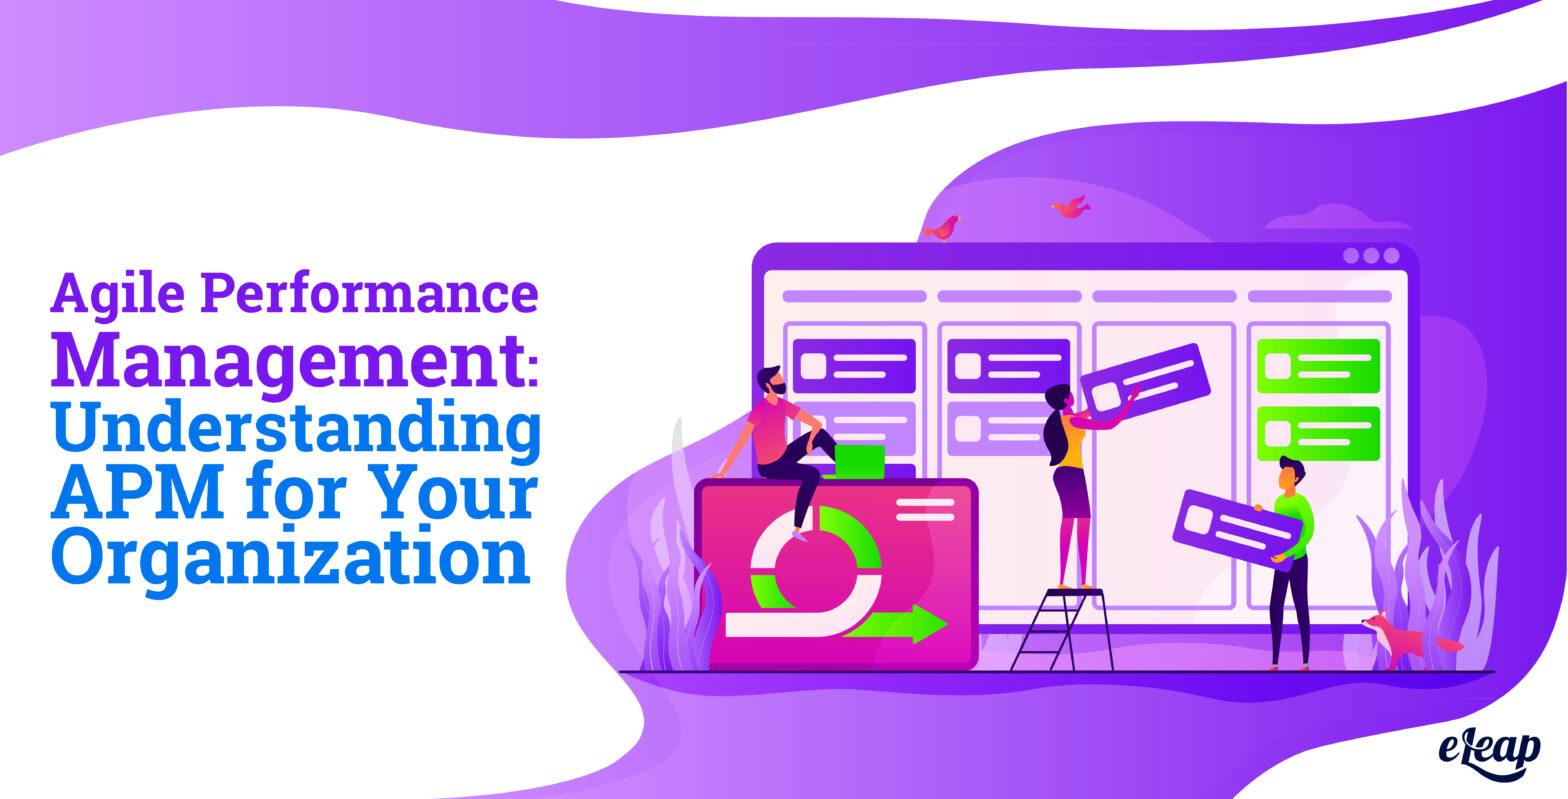 Agile Performance Management: Understanding APM for Your Organization